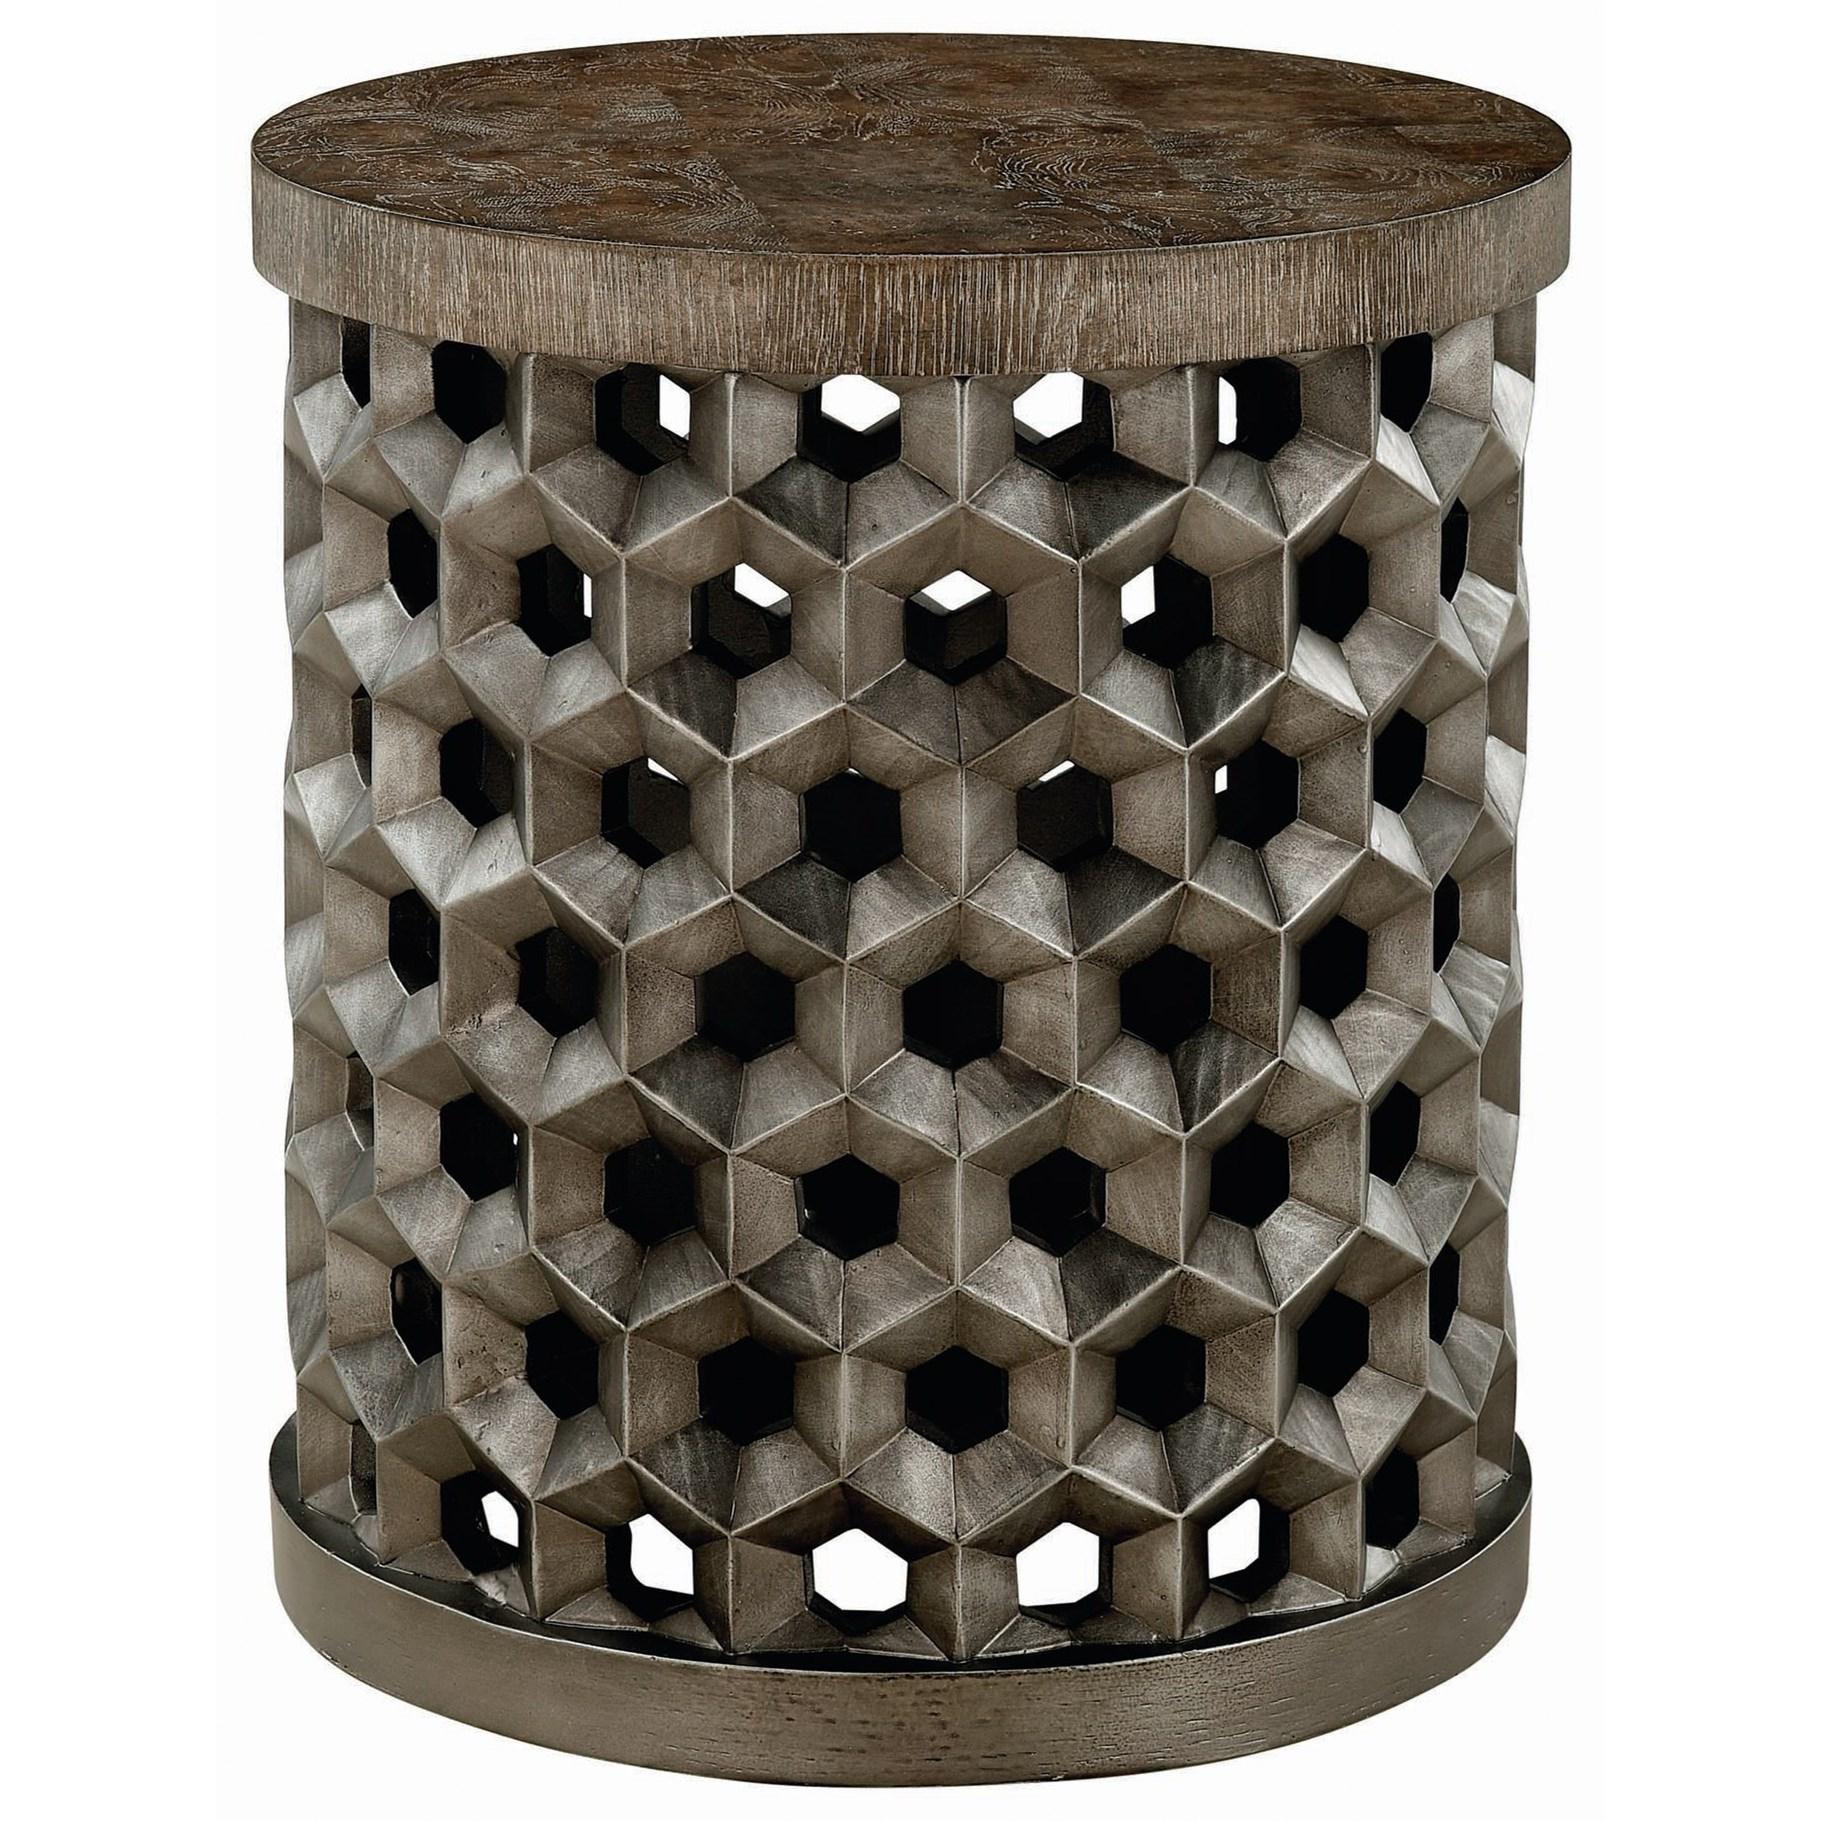 A.R.T. Furniture Inc Geode Tanzanite Drum Table - Item Number: 238305-0027